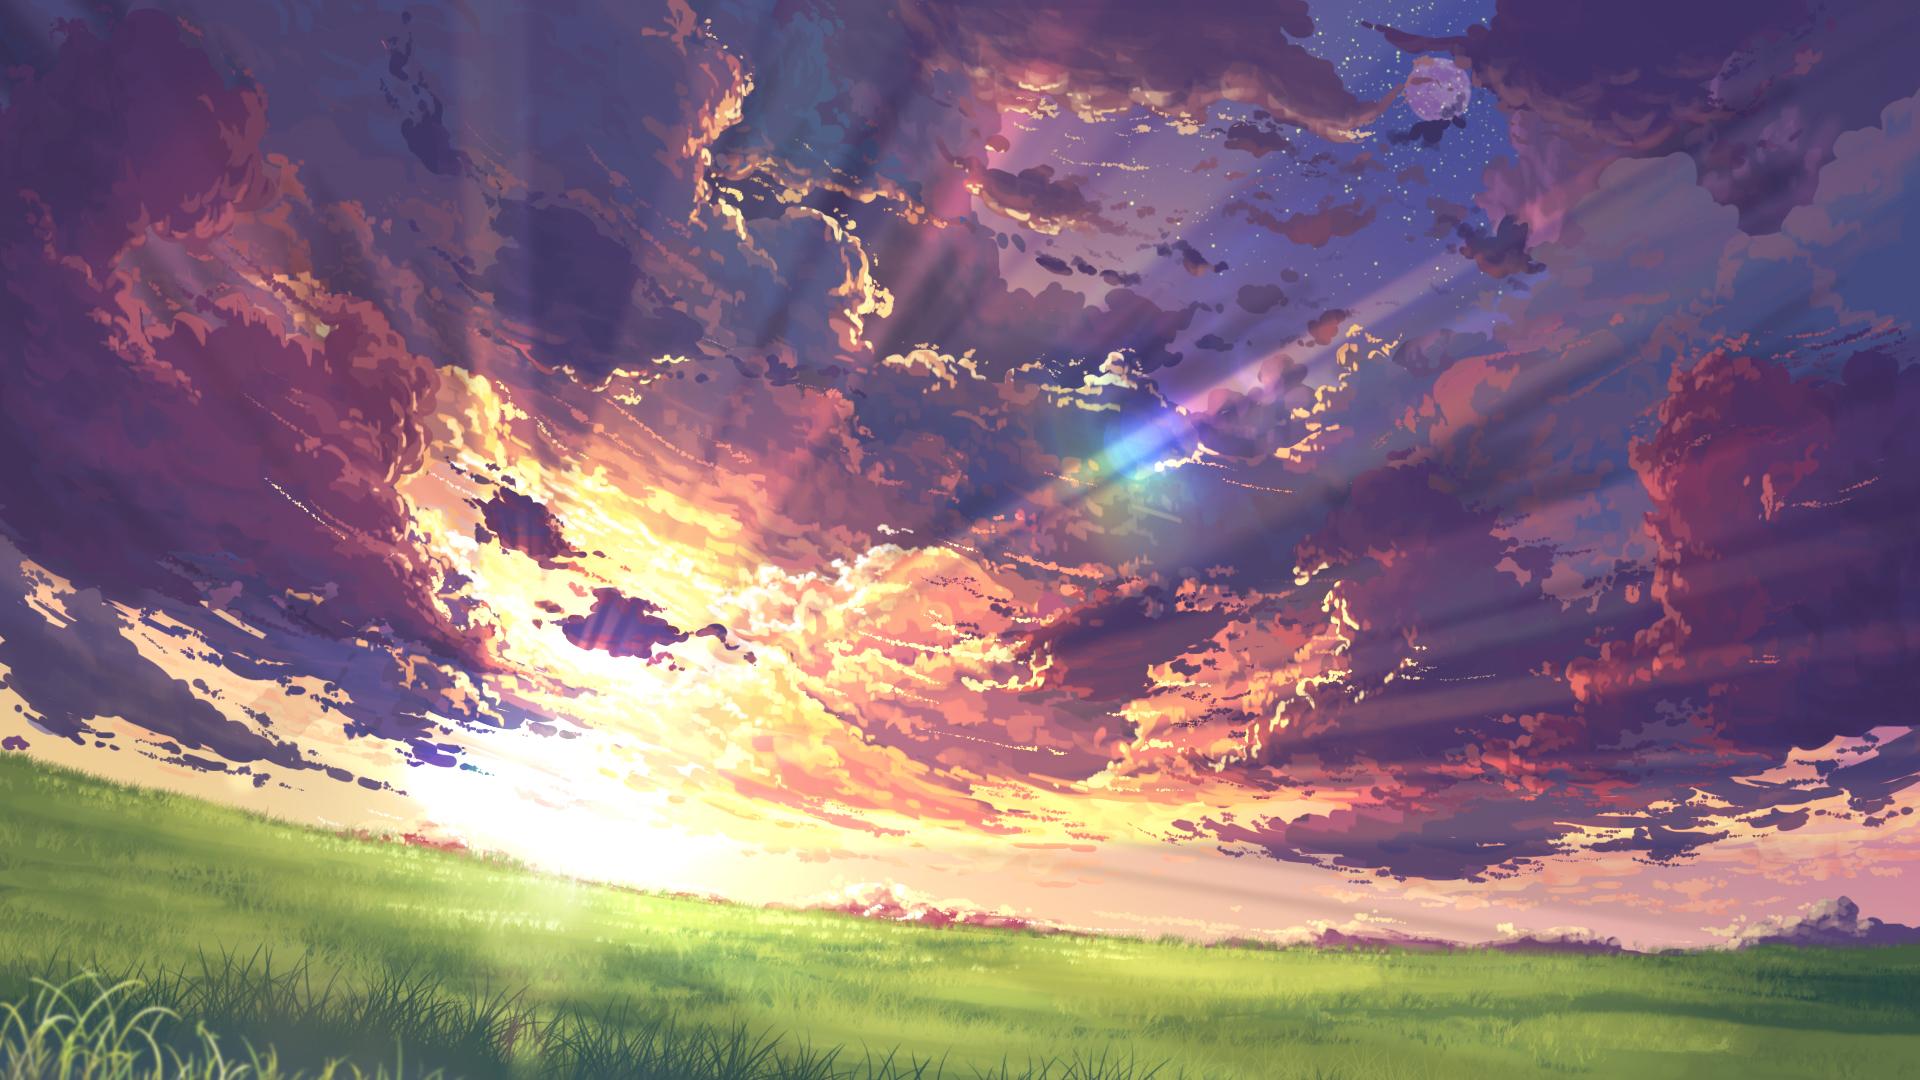 Random Anime Wallpapers In 2021 Anime Wallpaper 1920x1080 Anime Scenery Scenery Wallpaper